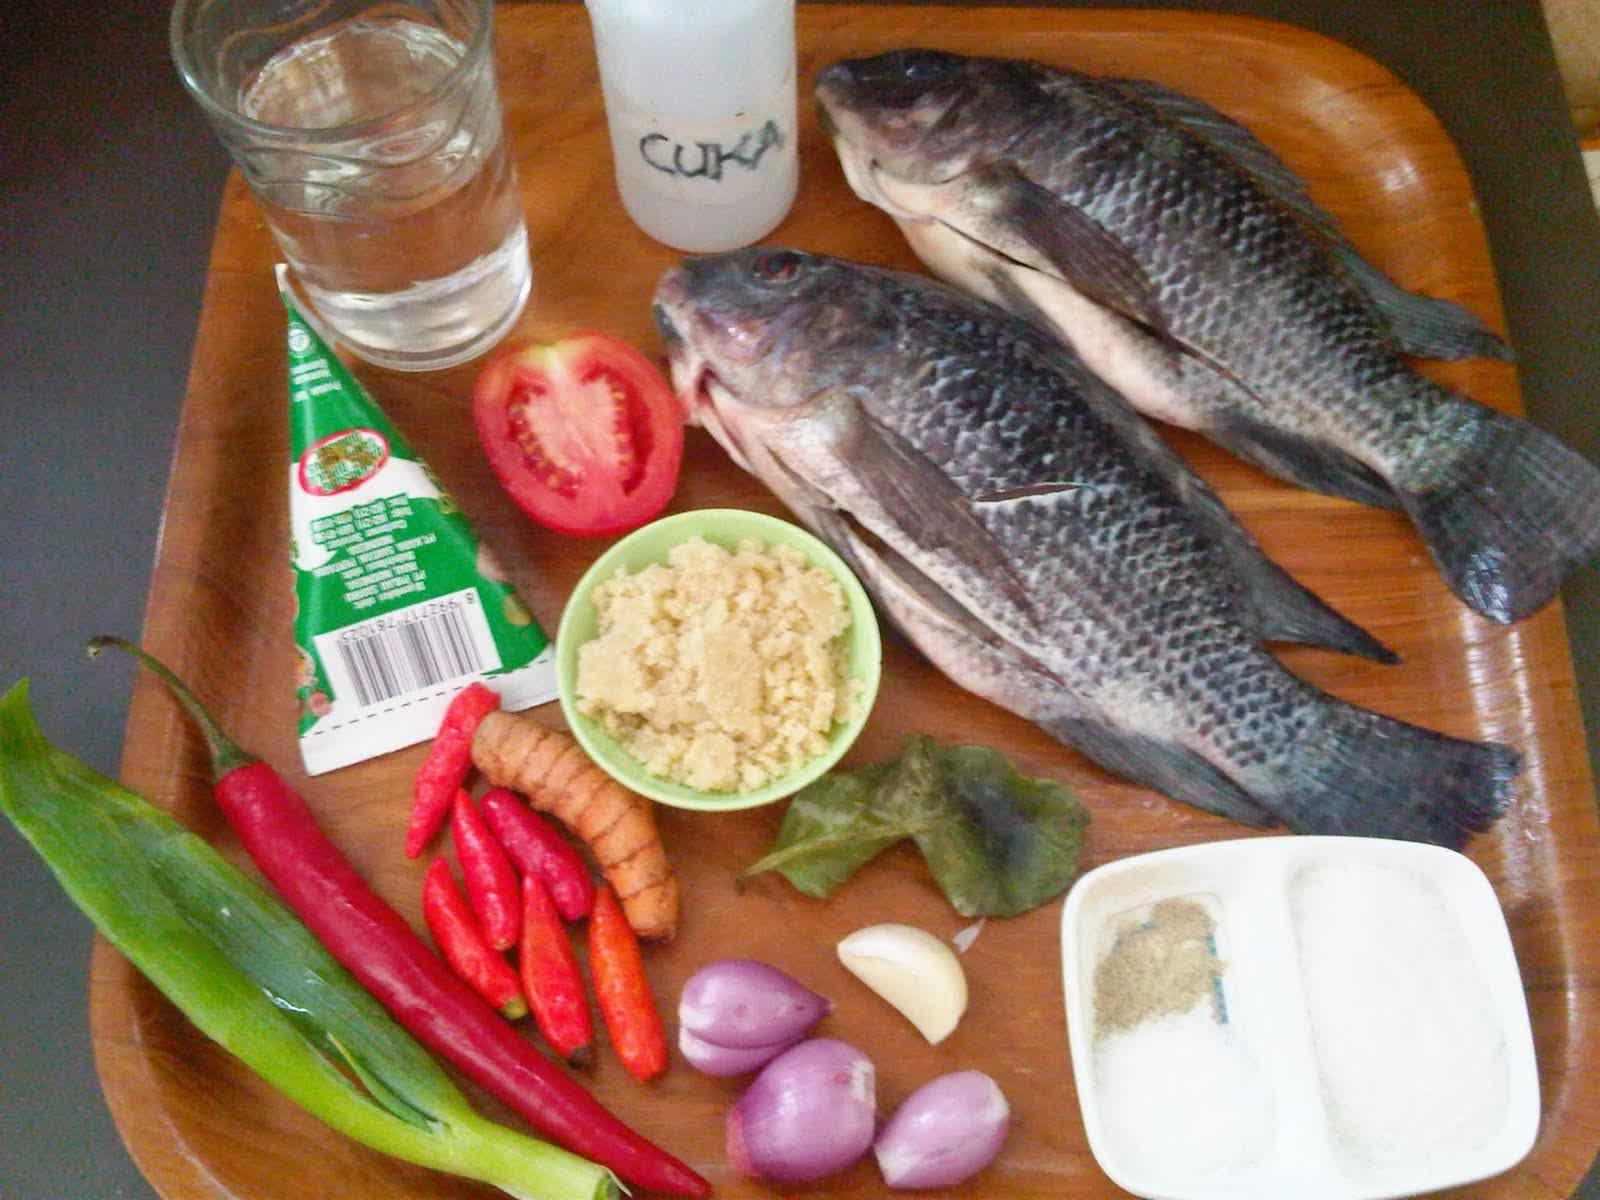 resep acar ikan, bahan acar ikan, resep acar ikan nila